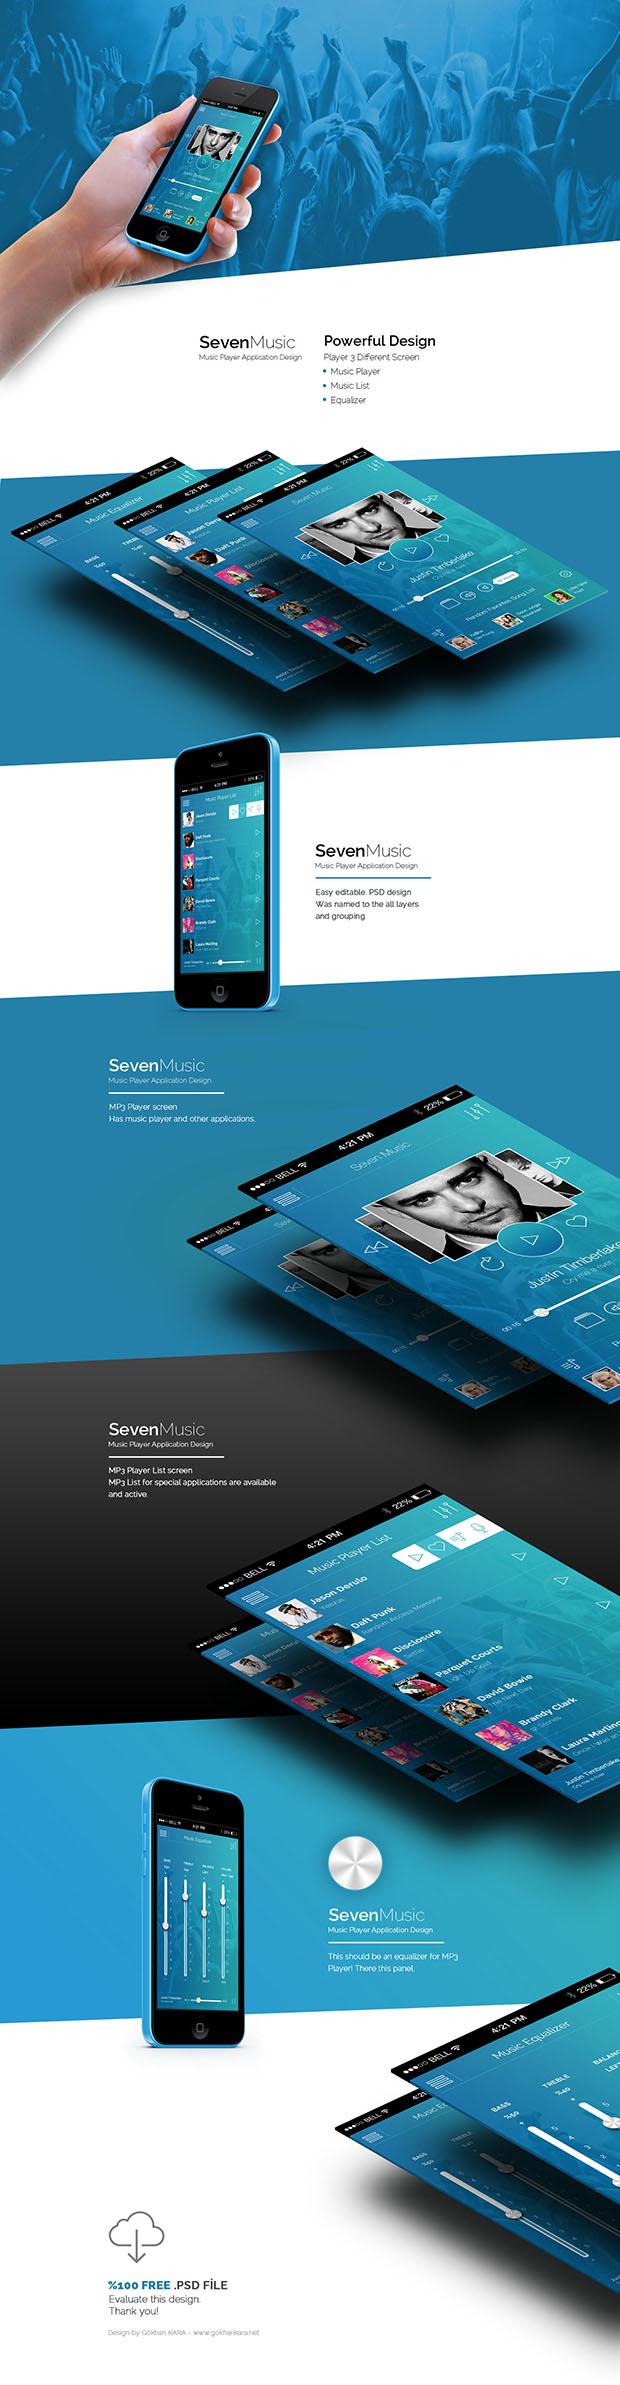 Seven-Music-Music-Player-Application-Design